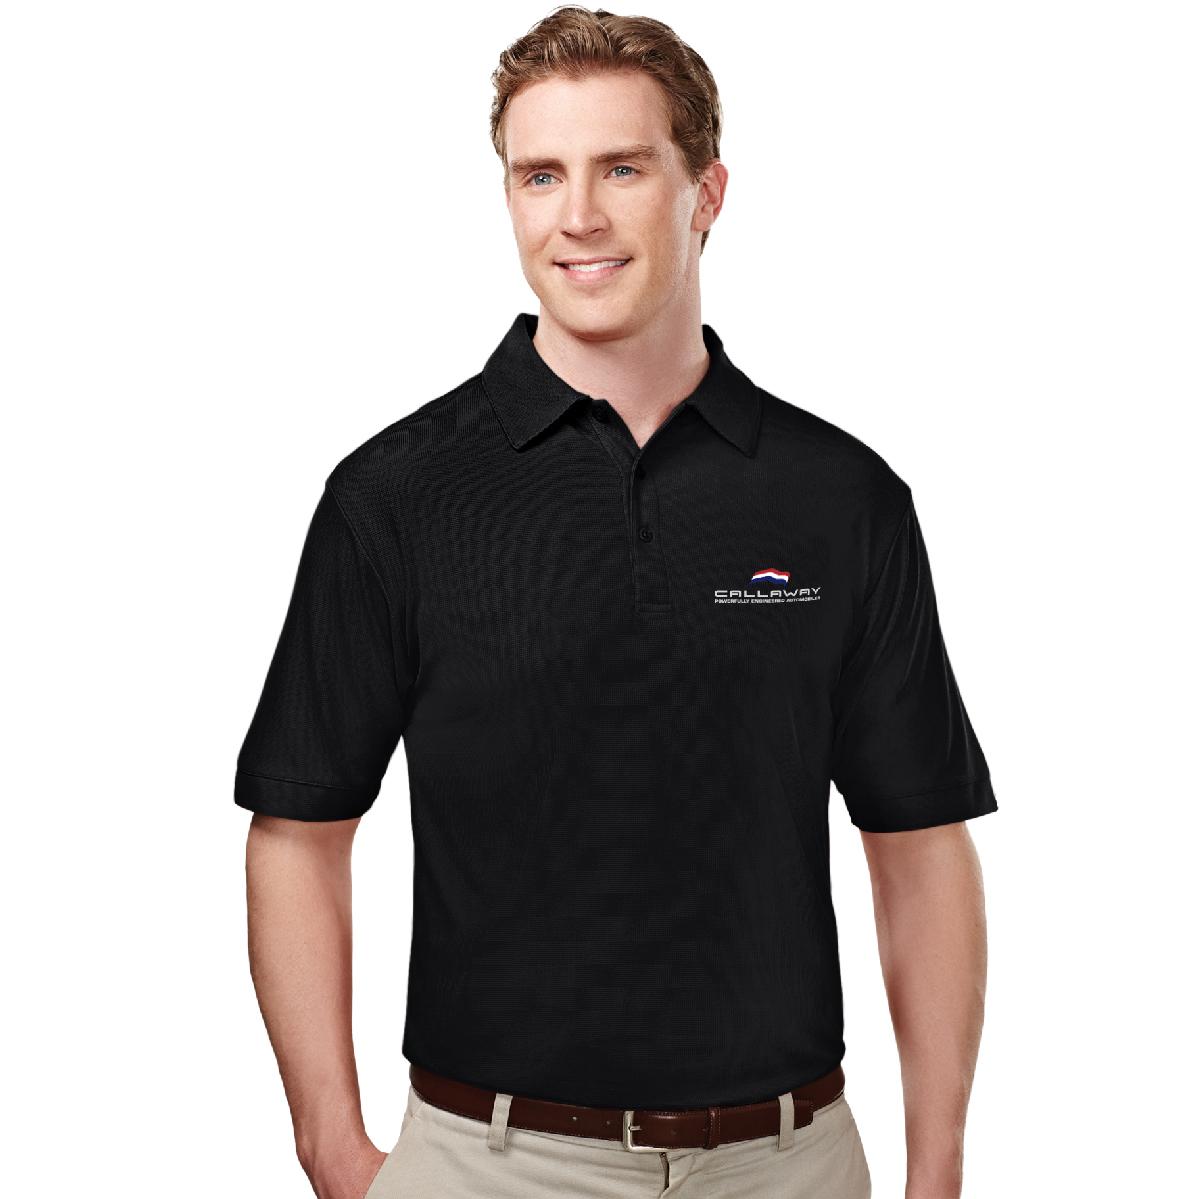 Callaway Cars Polo Shirt, Black